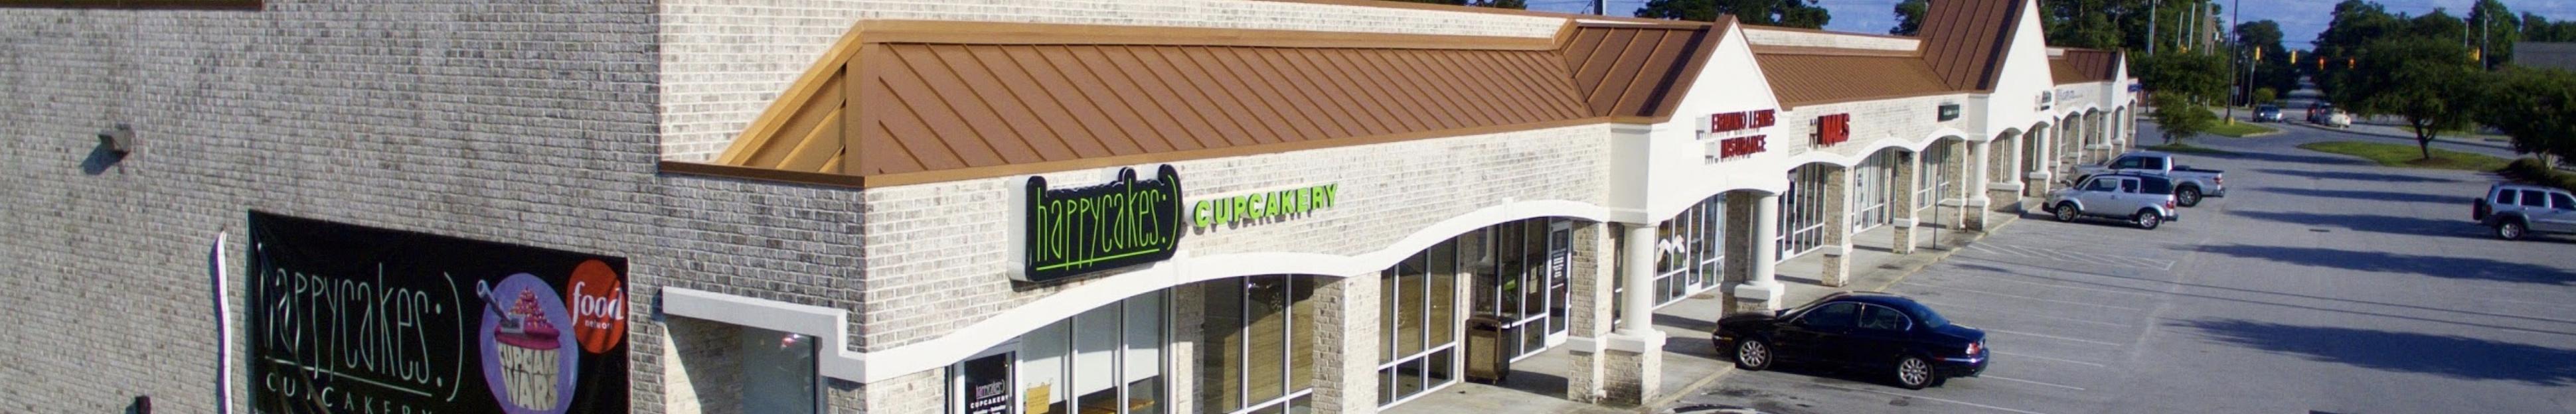 Pic of happycakes storefront